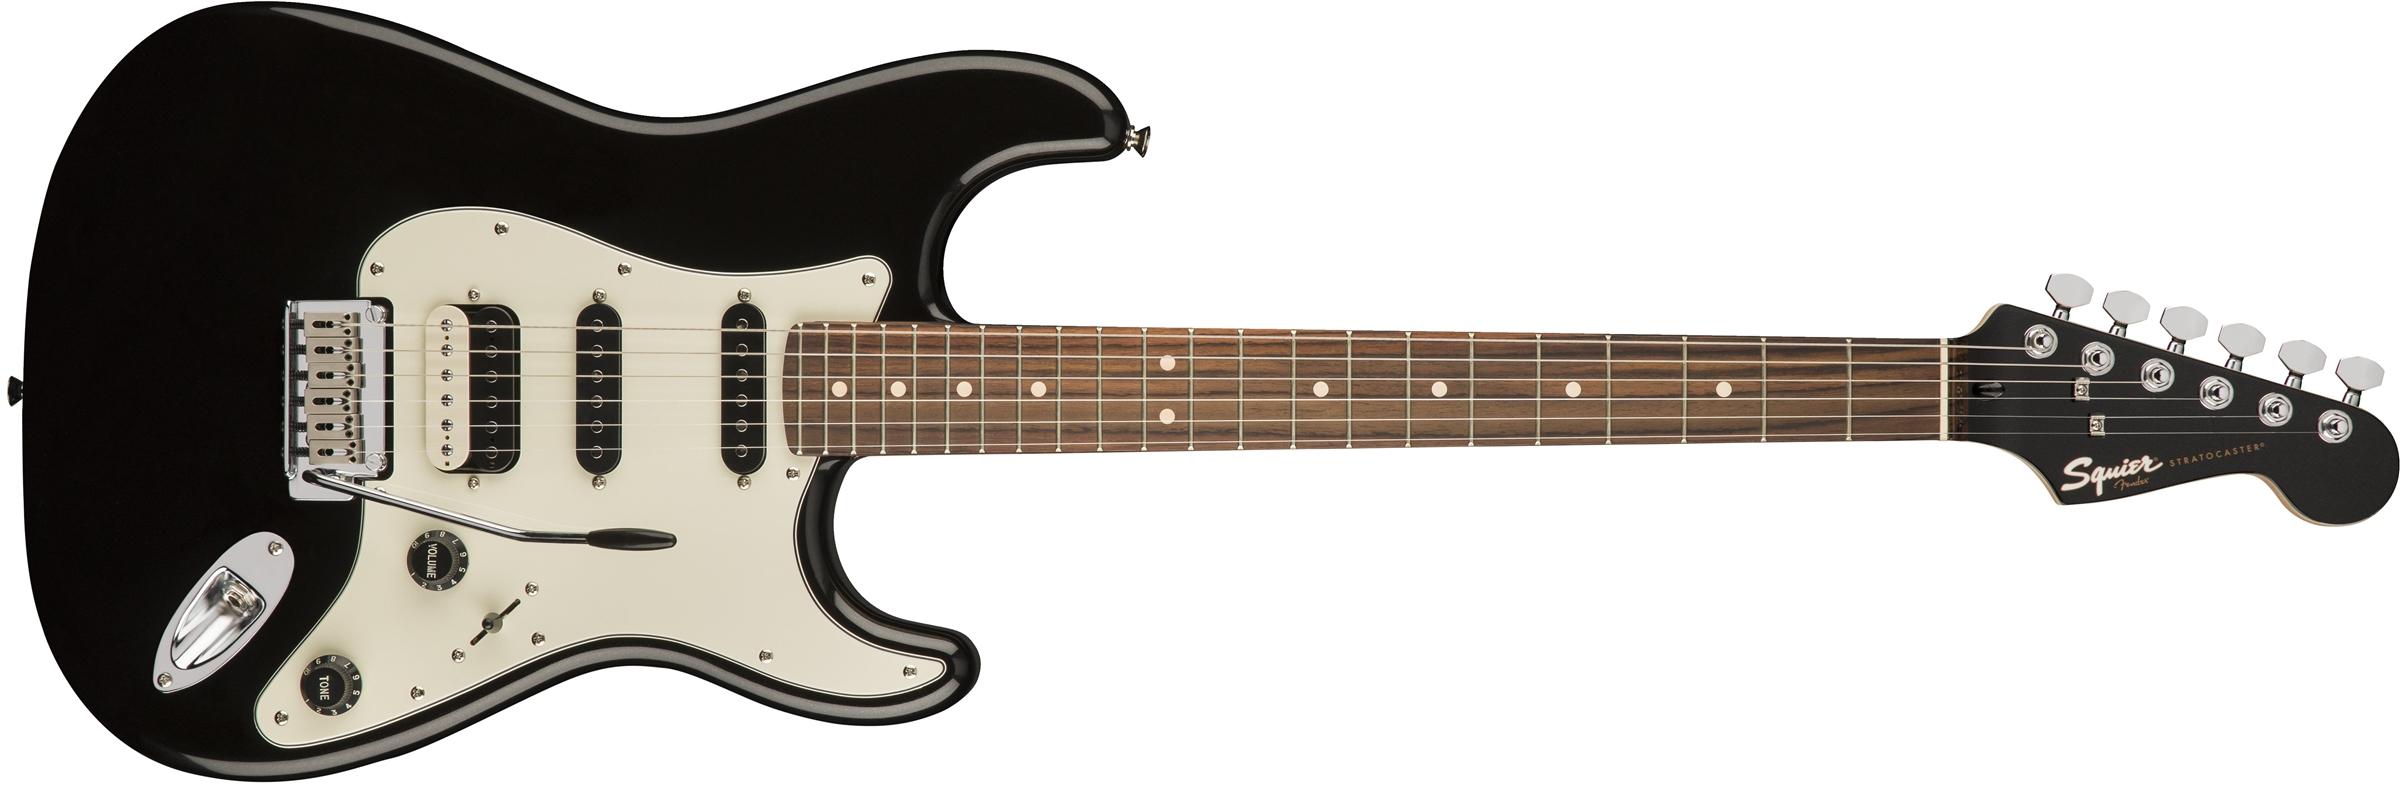 Fender 2019 Squier HSS Guitar